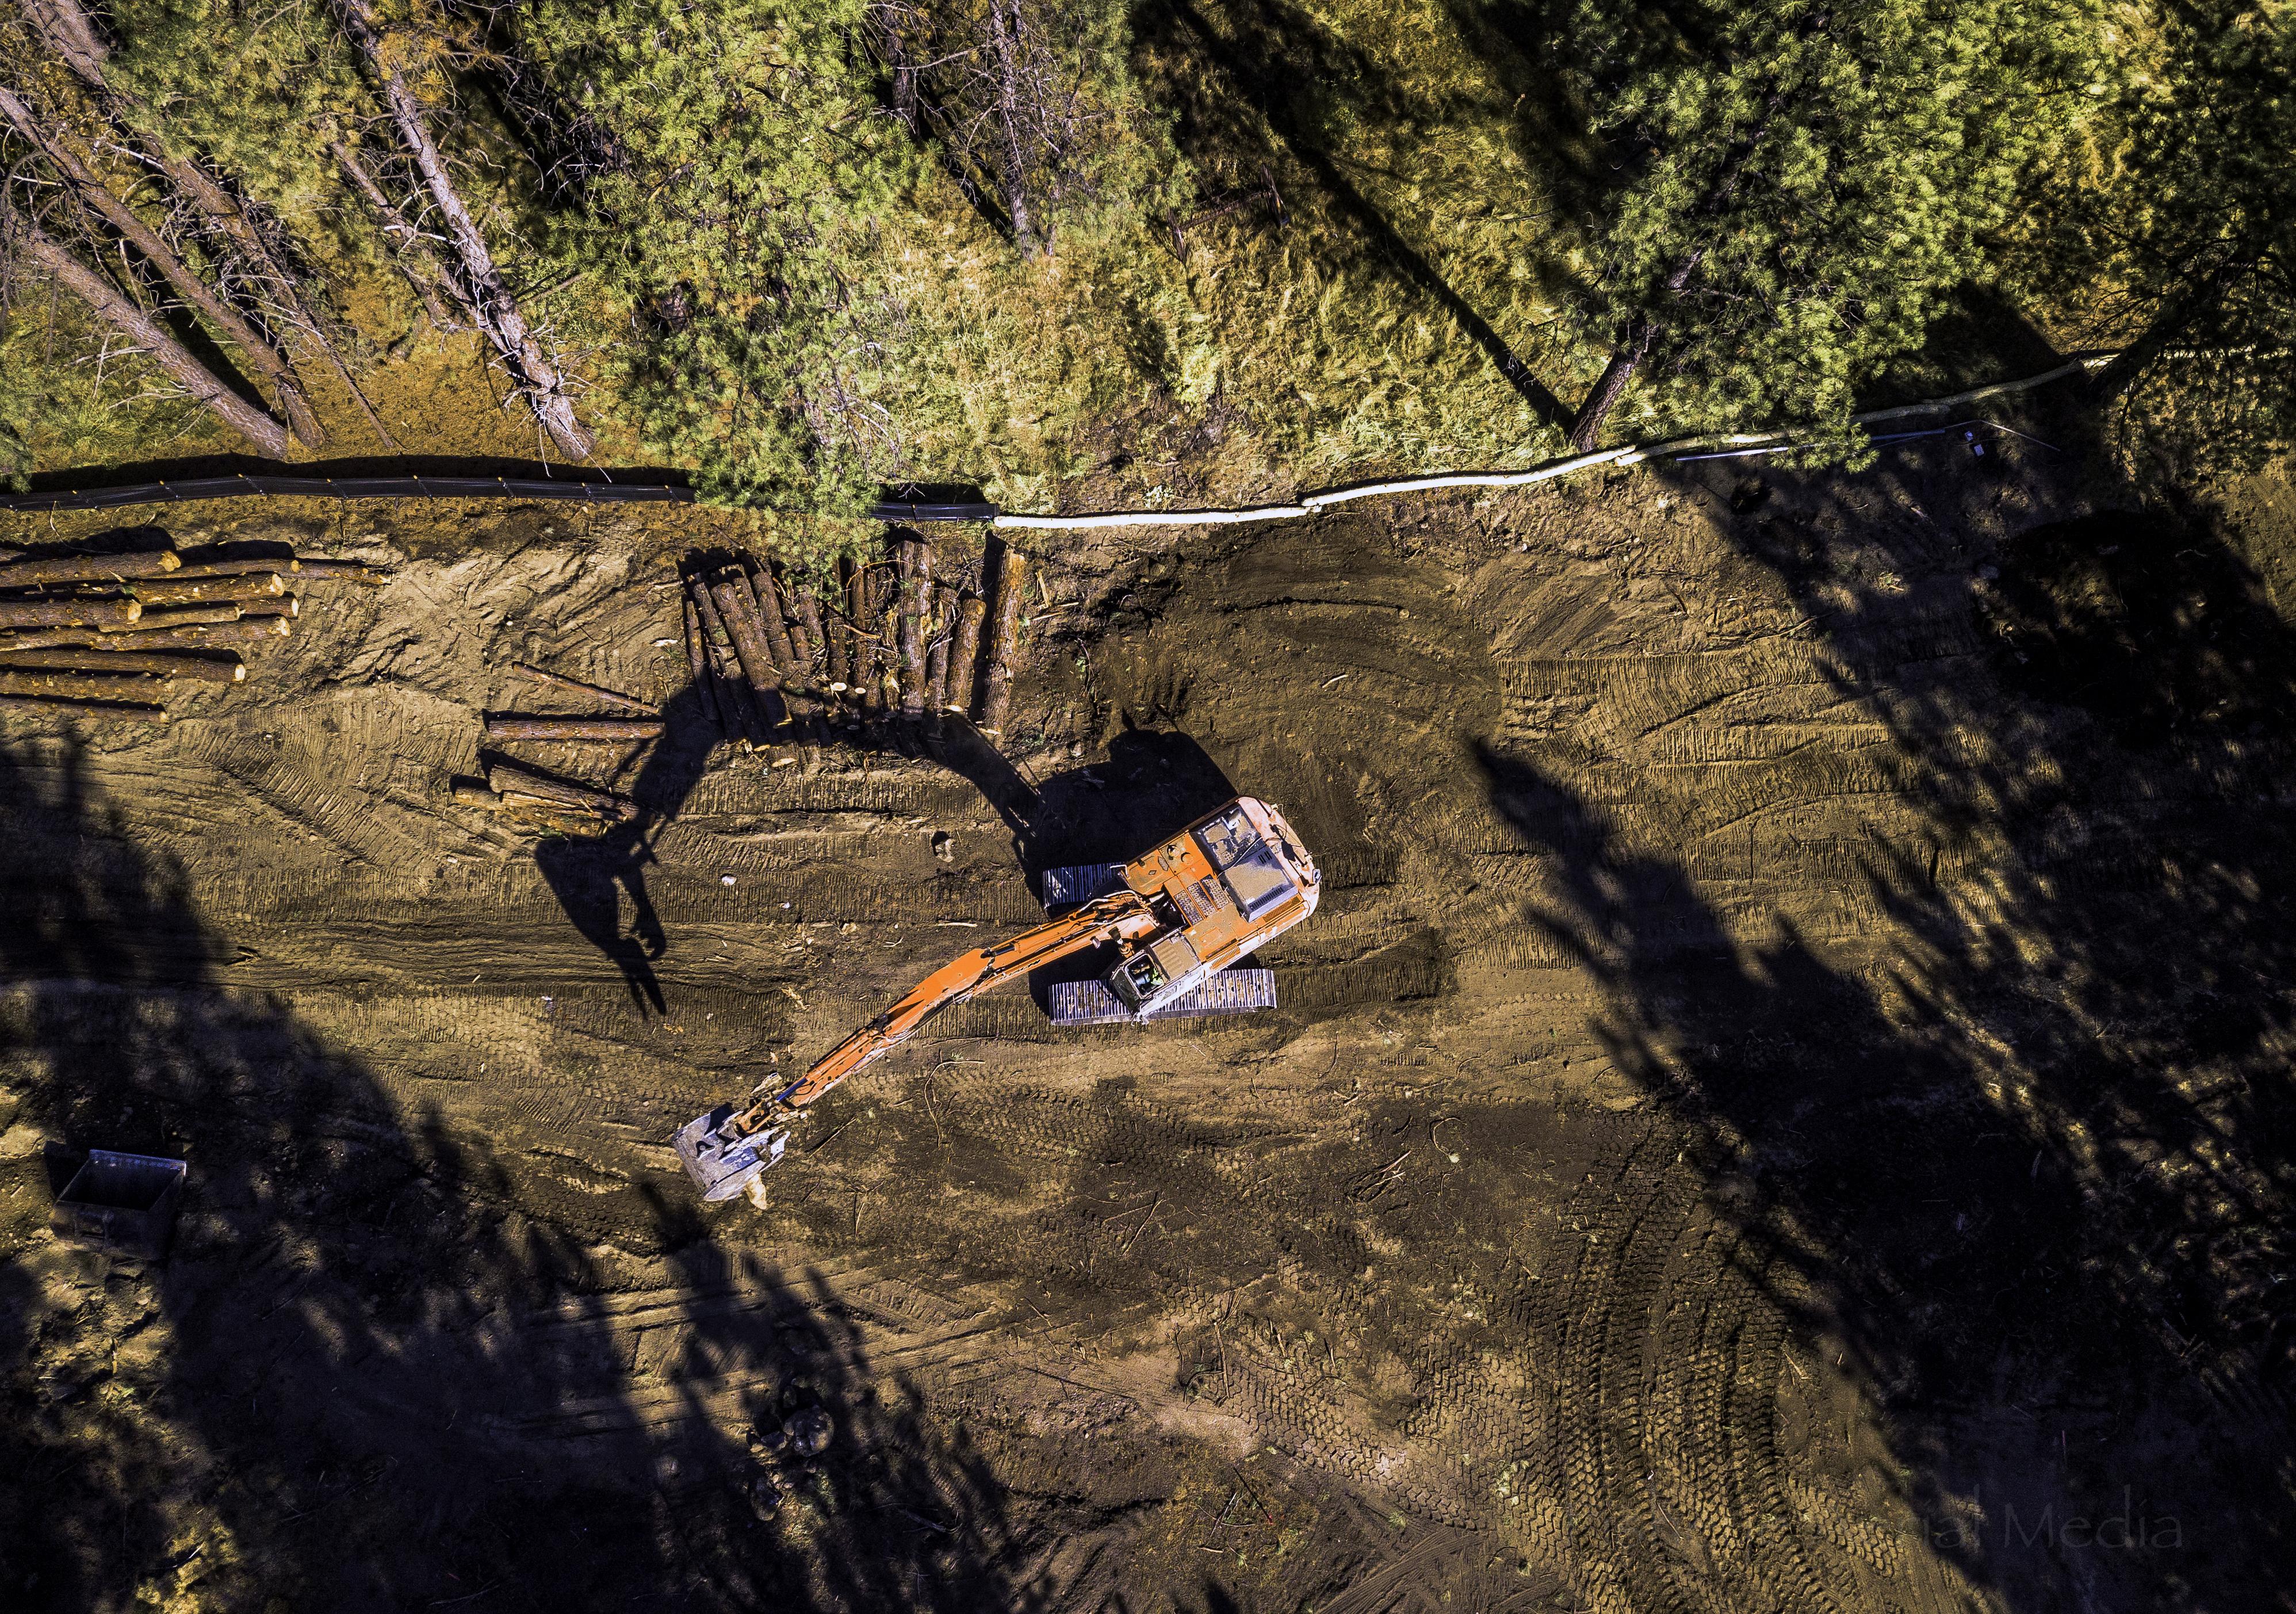 Latham excavator clearing trees